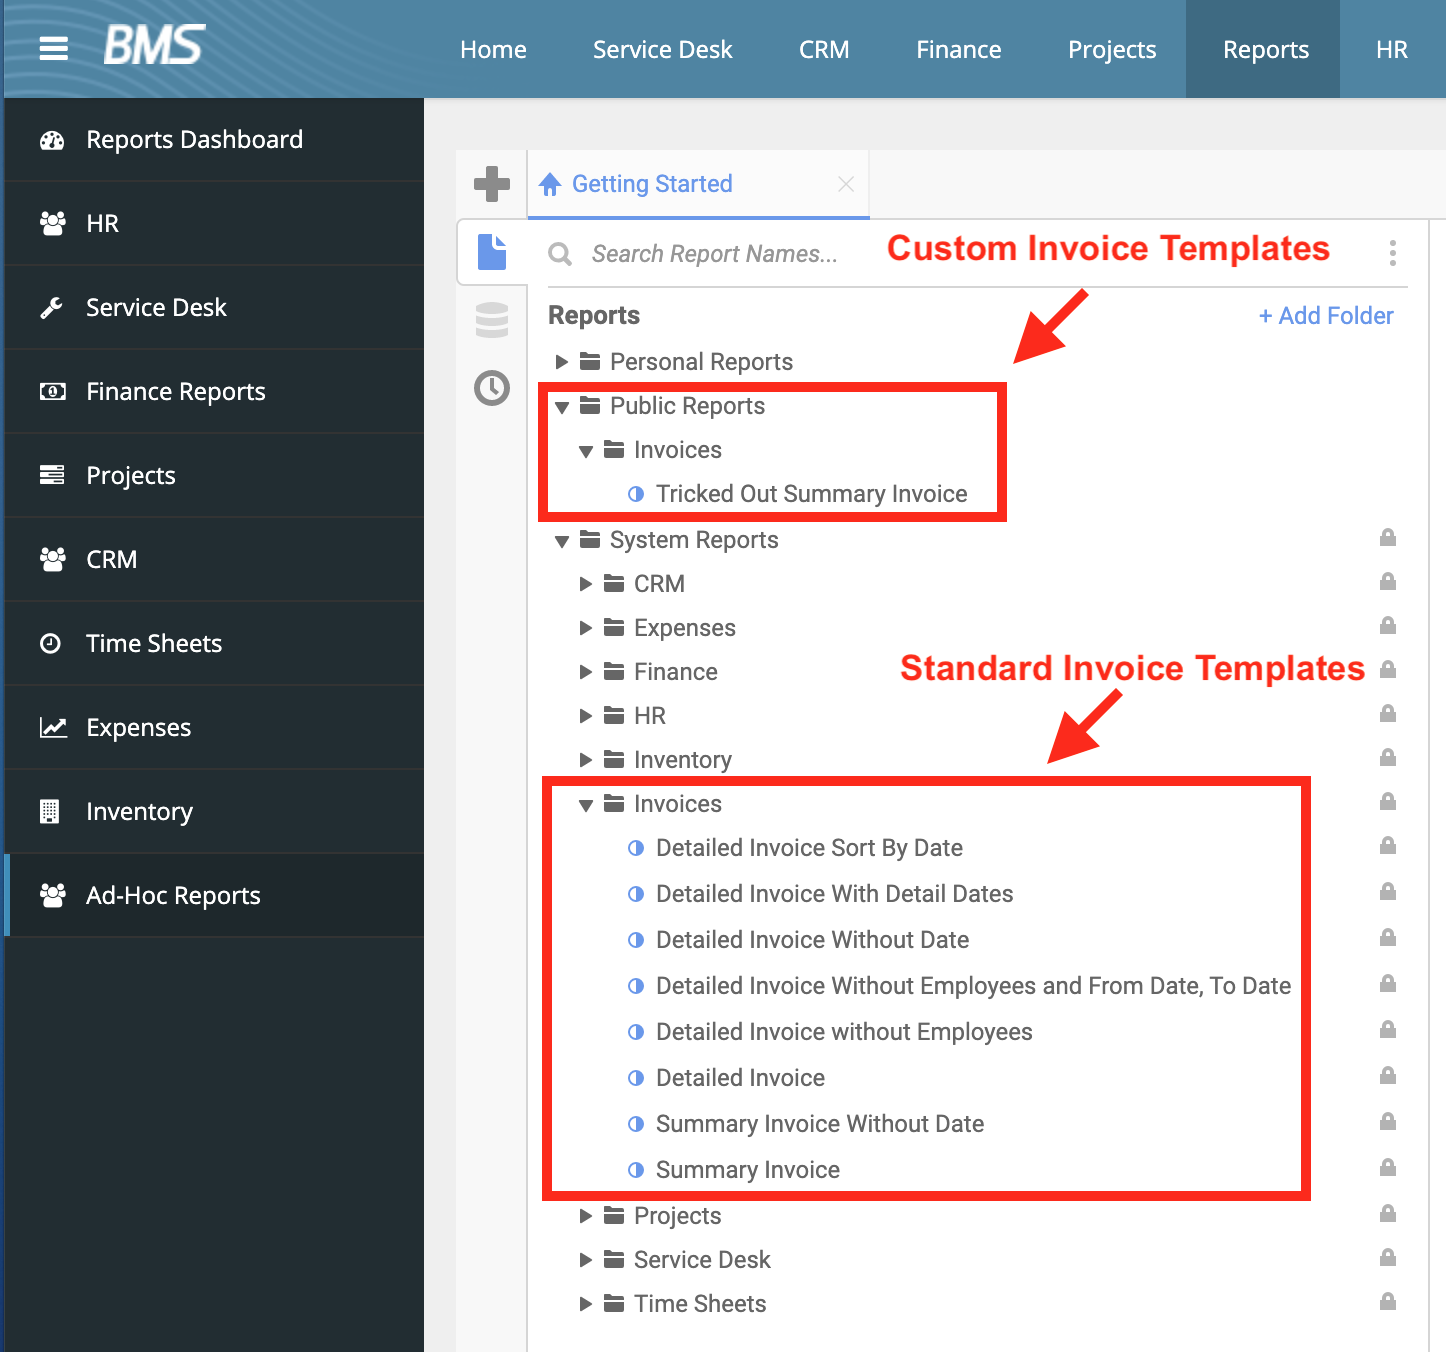 BMS_v4.0.29_-_Inv_Template_-_Ad_Hoc_Folders.png